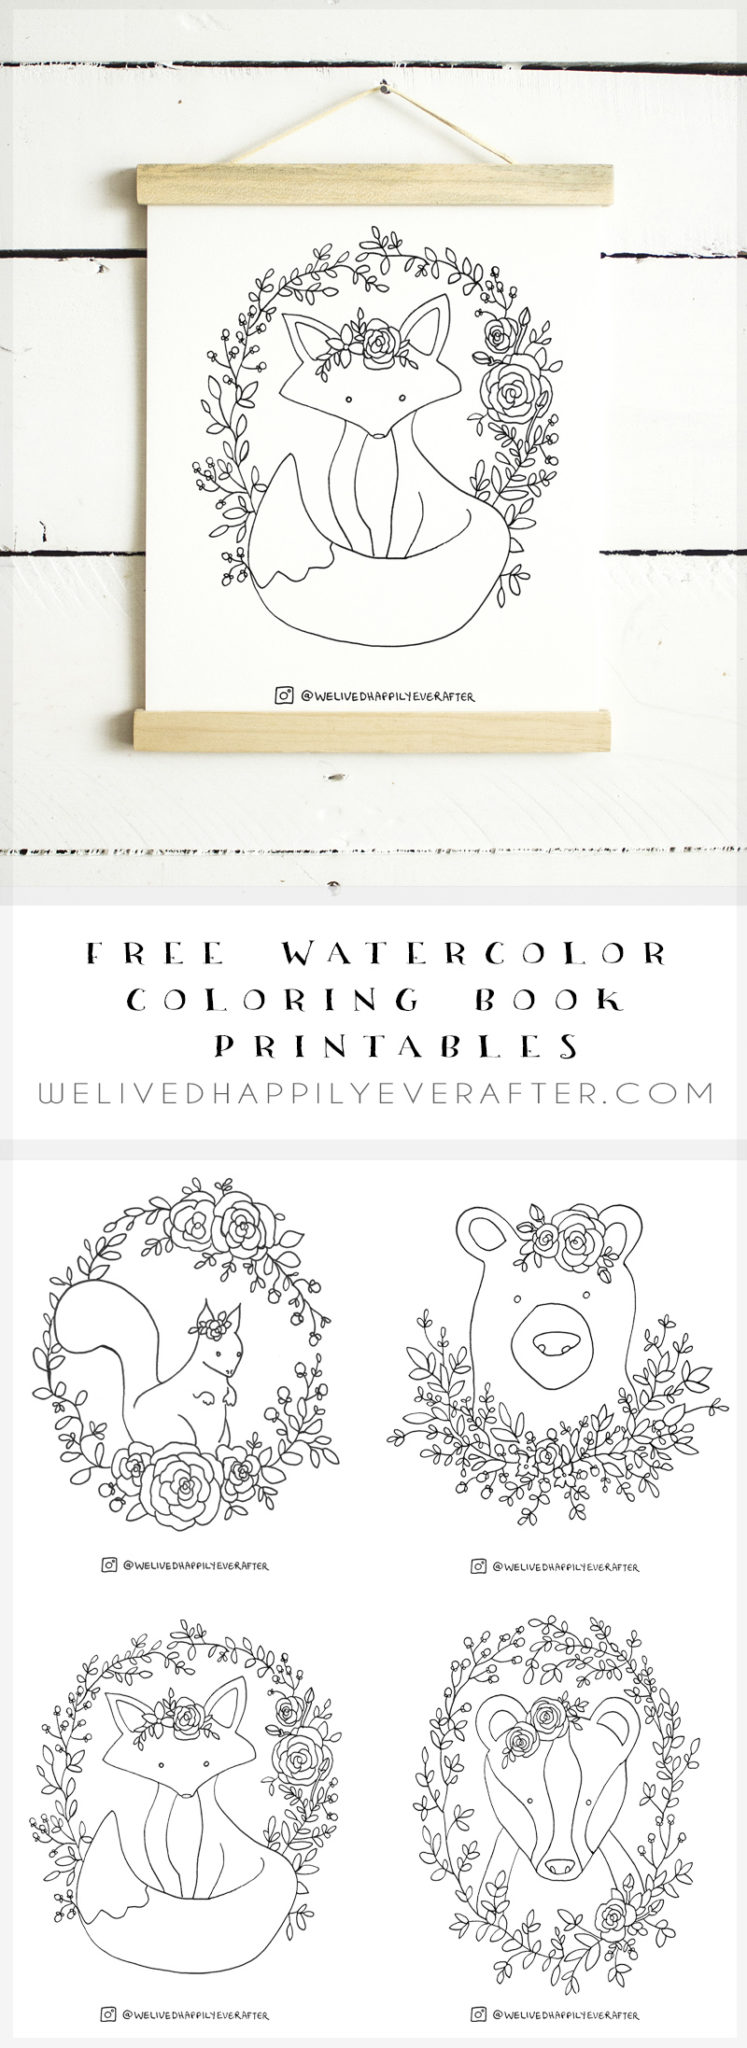 Free Watercolor Adult Coloring Book Printable Sheets